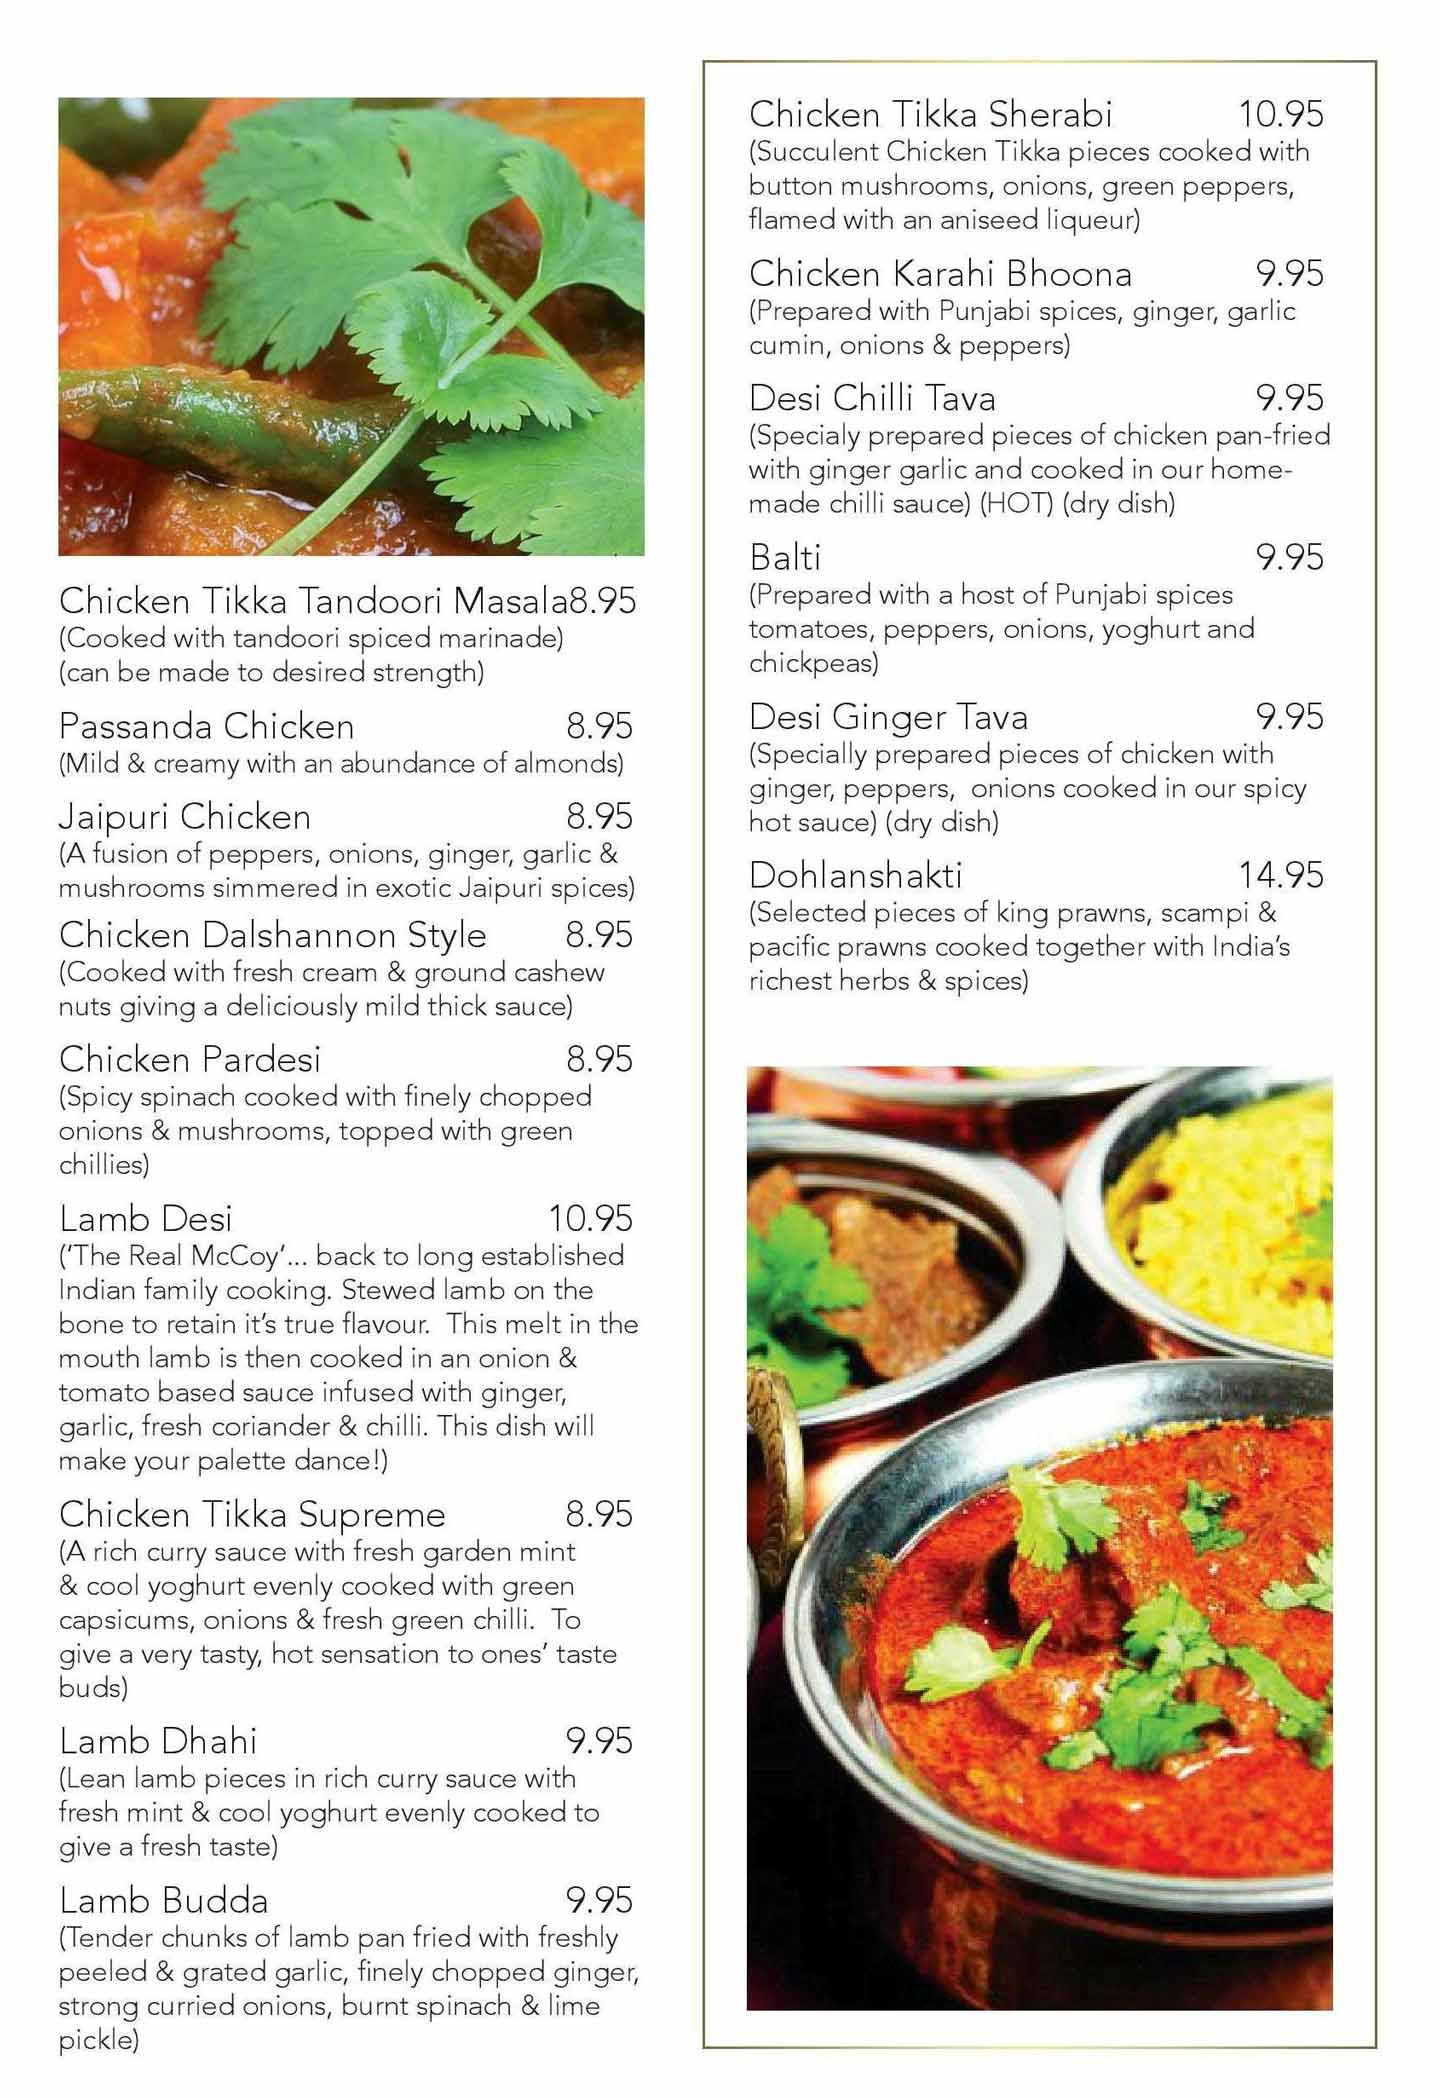 Indian cuisine cumbernauld dalshannon farm download pdf menu forumfinder Gallery